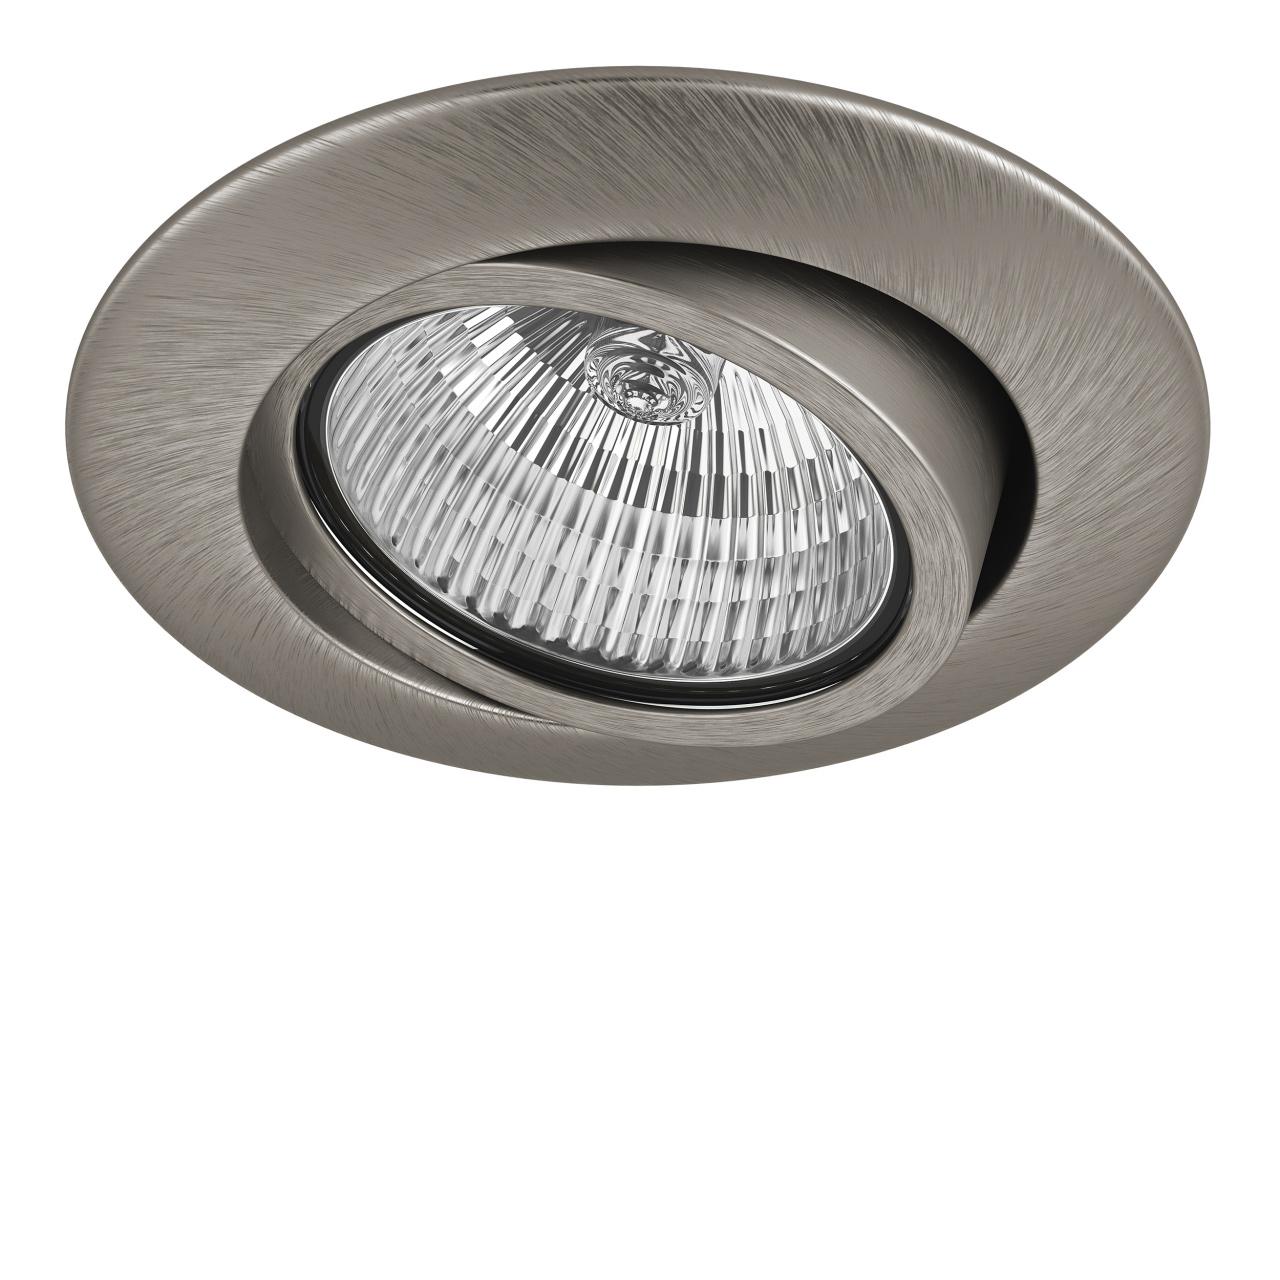 Светильник Teso ADJ MR16 / HP16 никель Lightstar 011085